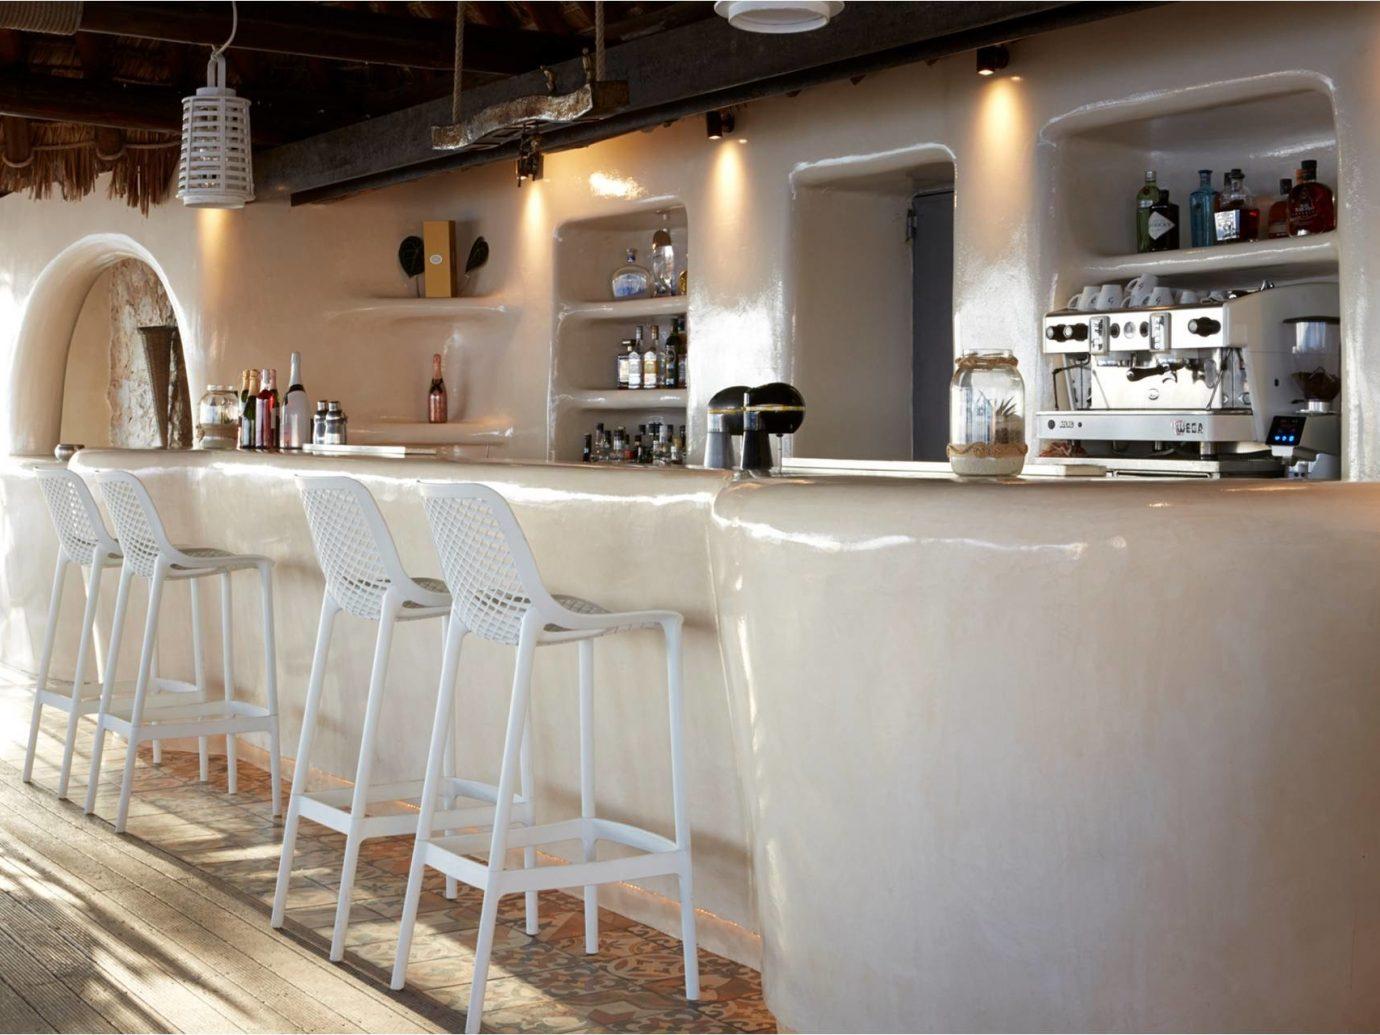 Trip Ideas indoor room interior design restaurant toilet meal Lobby